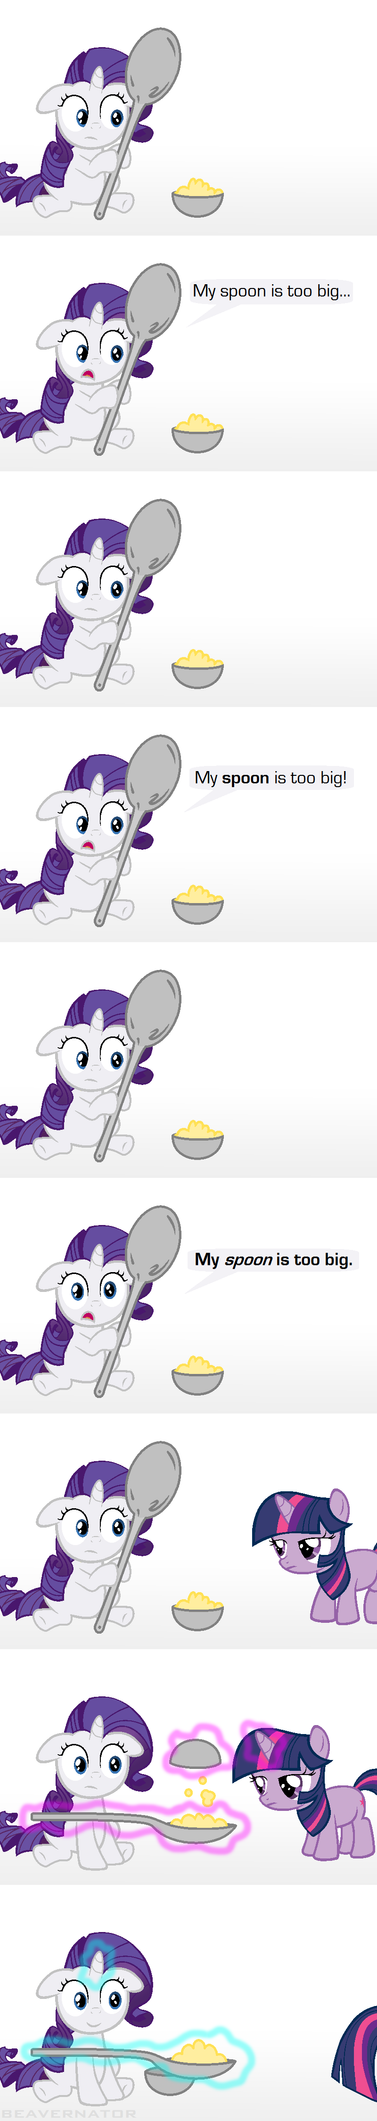 my-spoon-is-too-big-my-anus